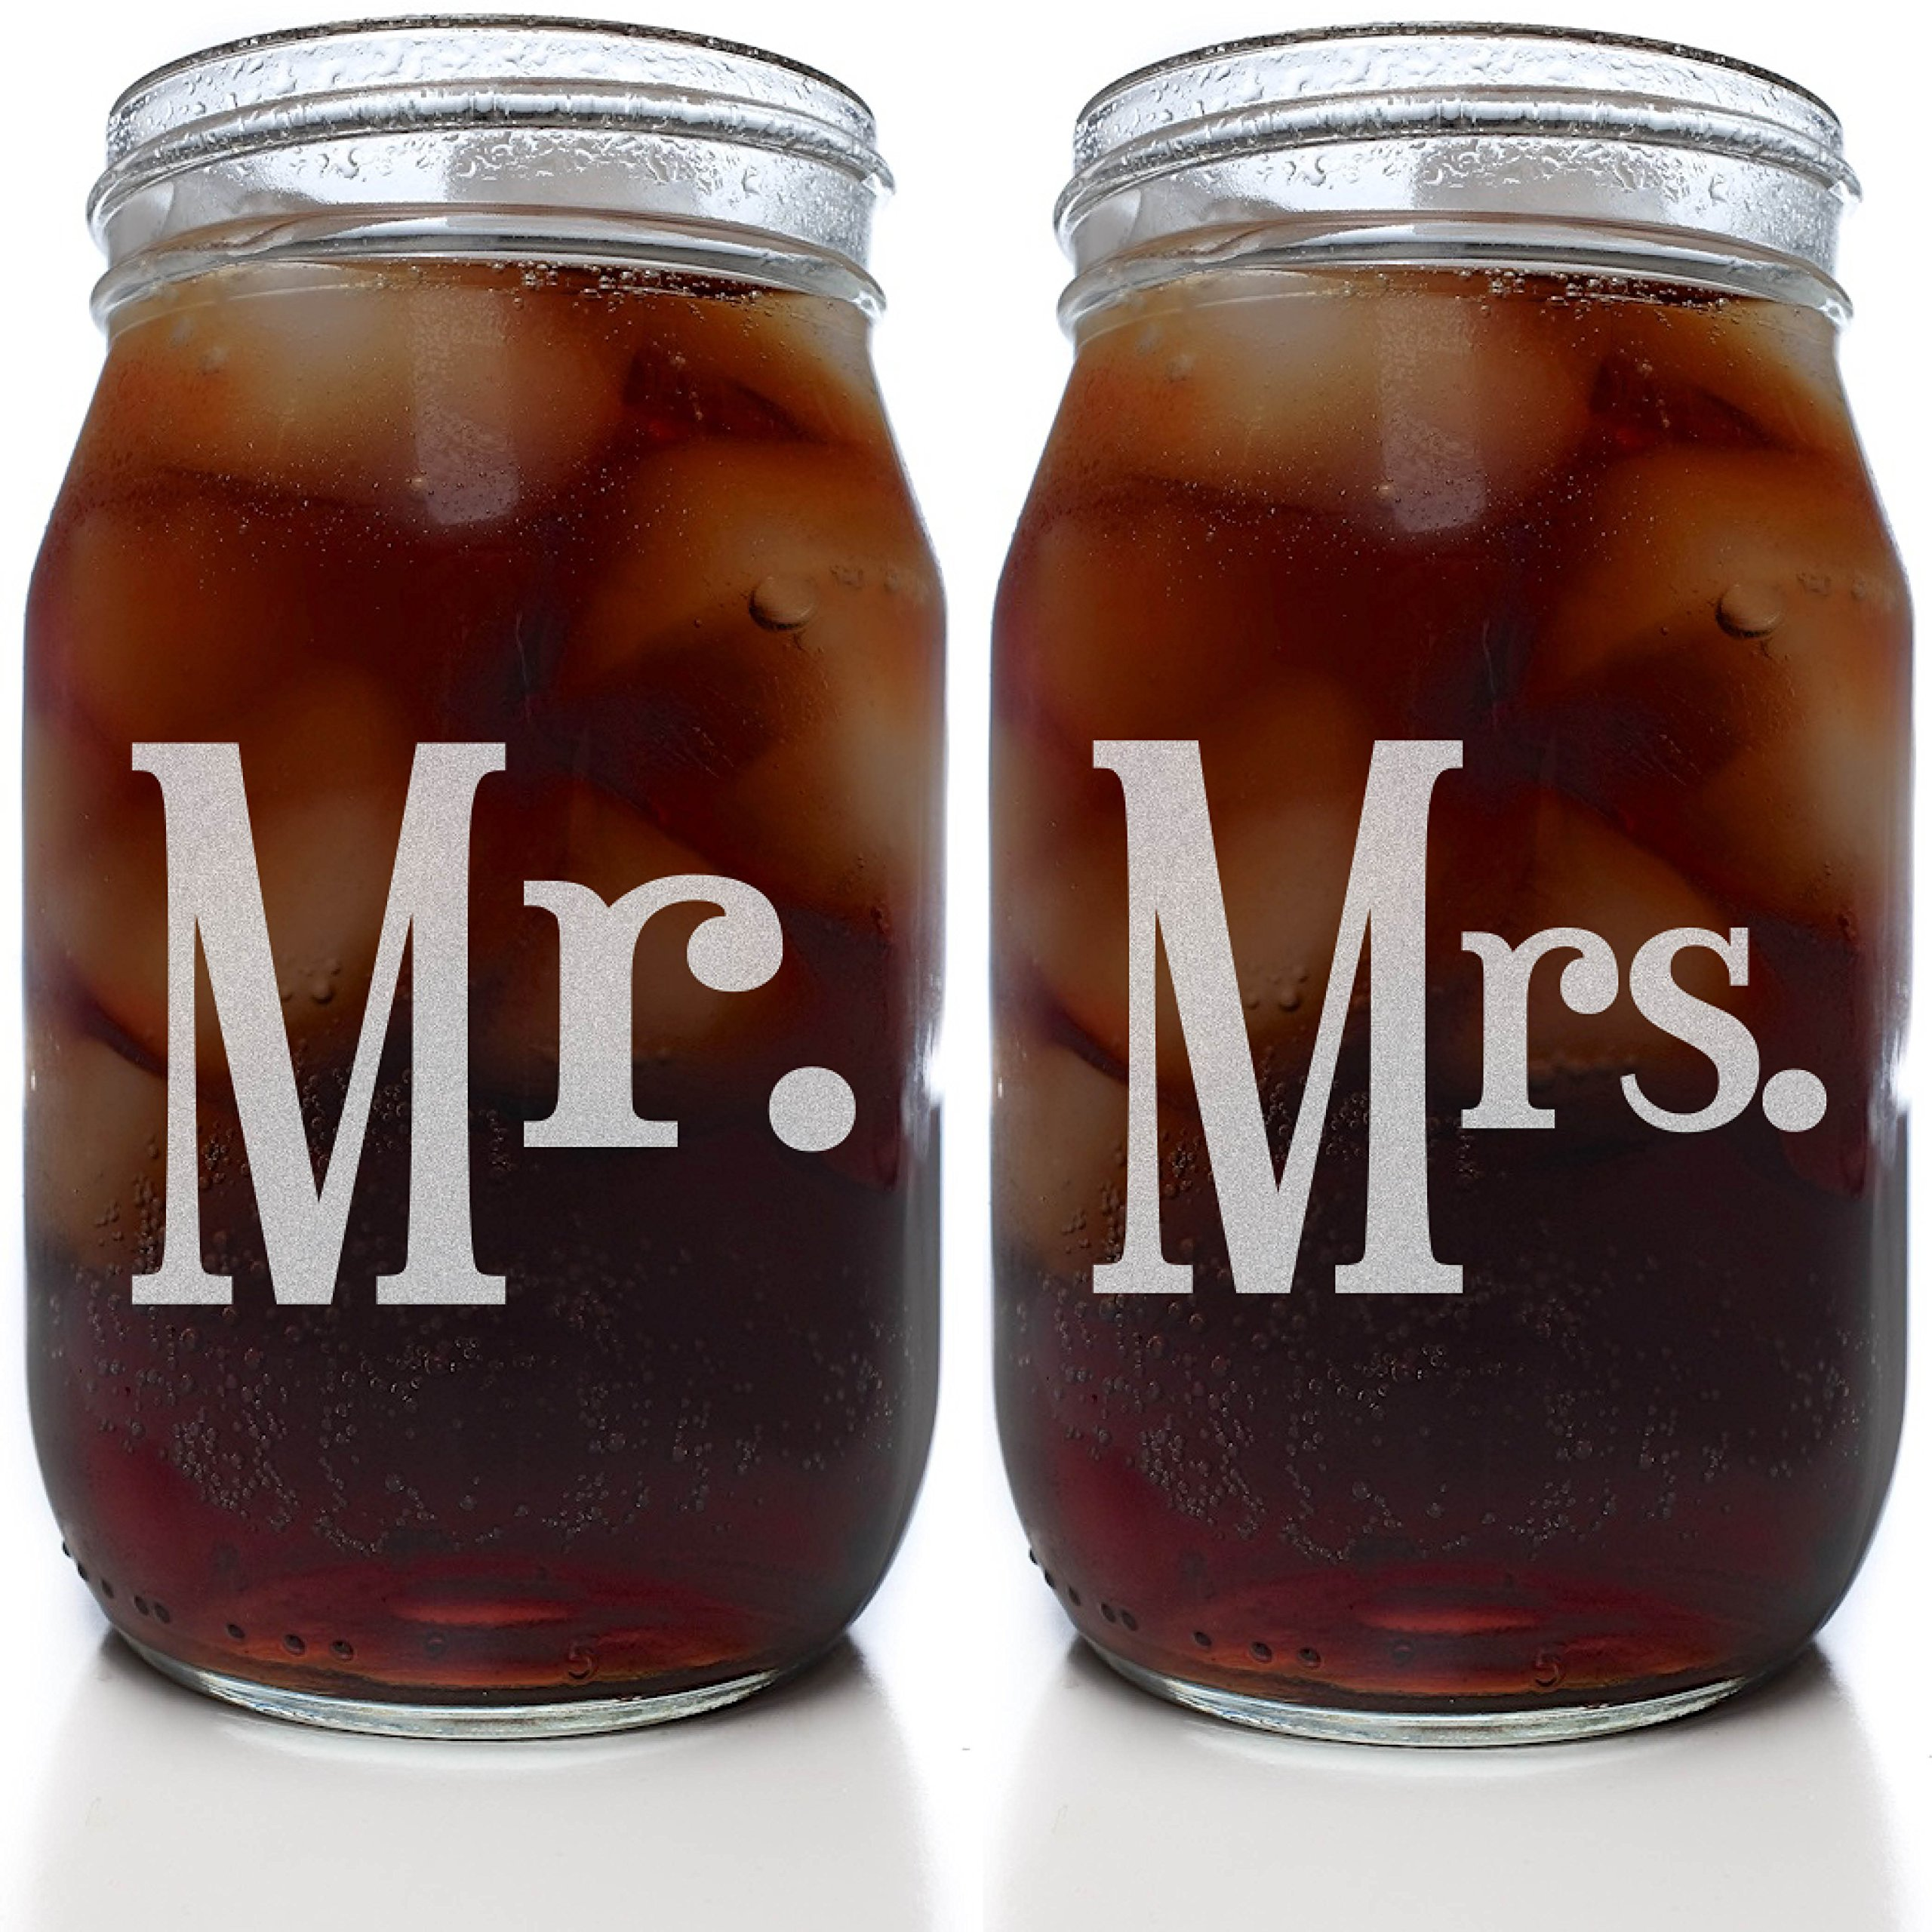 Mr & Mrs Mason Jar Set (Set of 2 Clear 16 oz. Mason Jar Glasses)